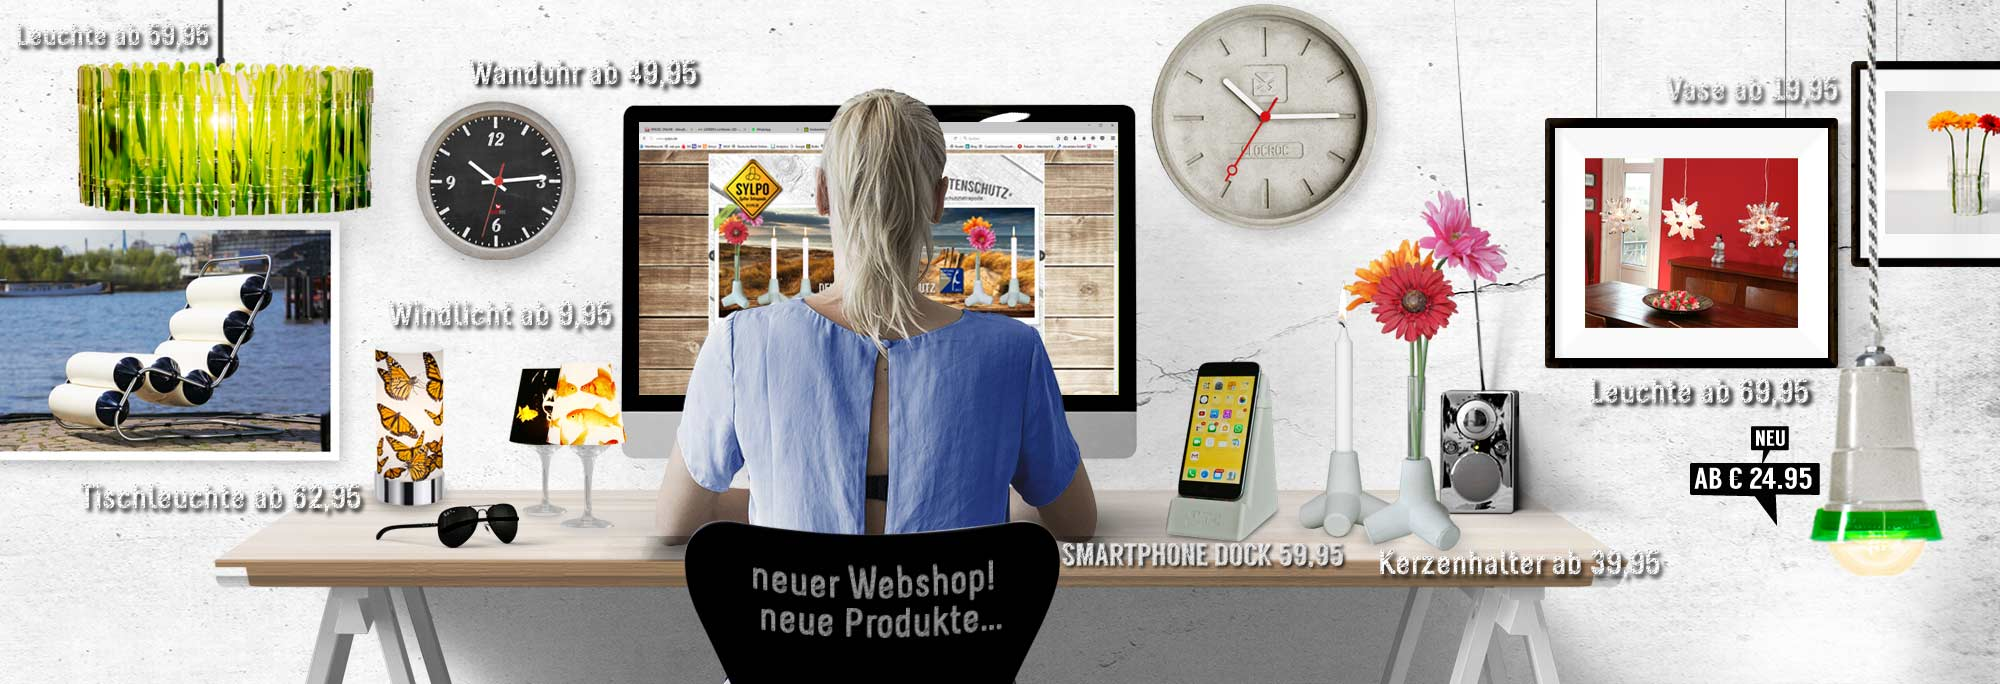 Ambientshop Home and Office Design-Accessoires, individualisierbares ...